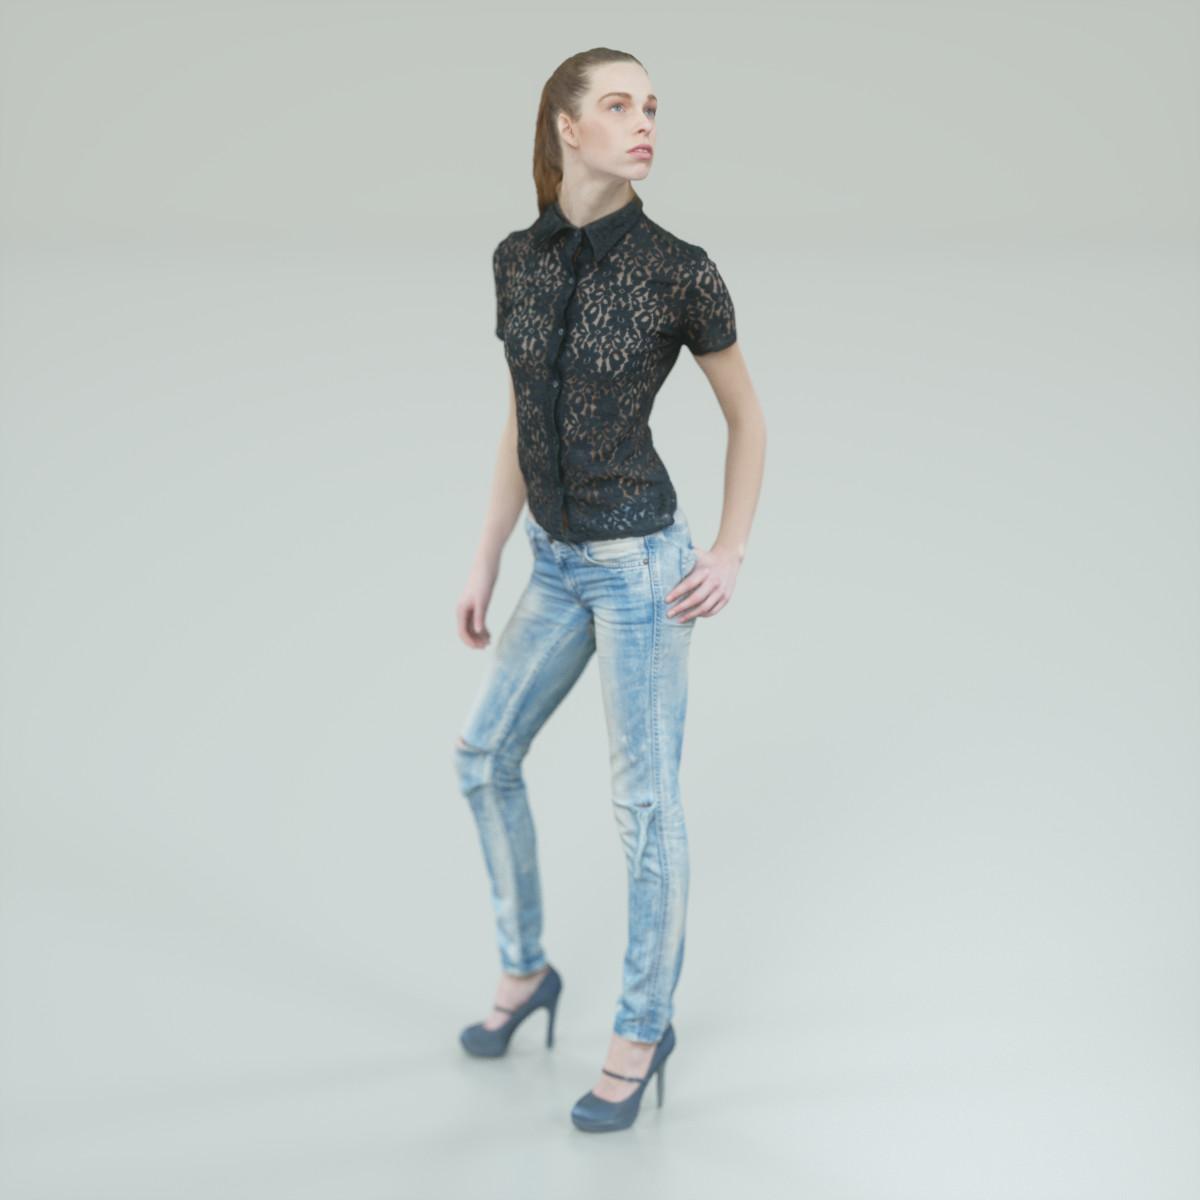 Torn Jeans Girl